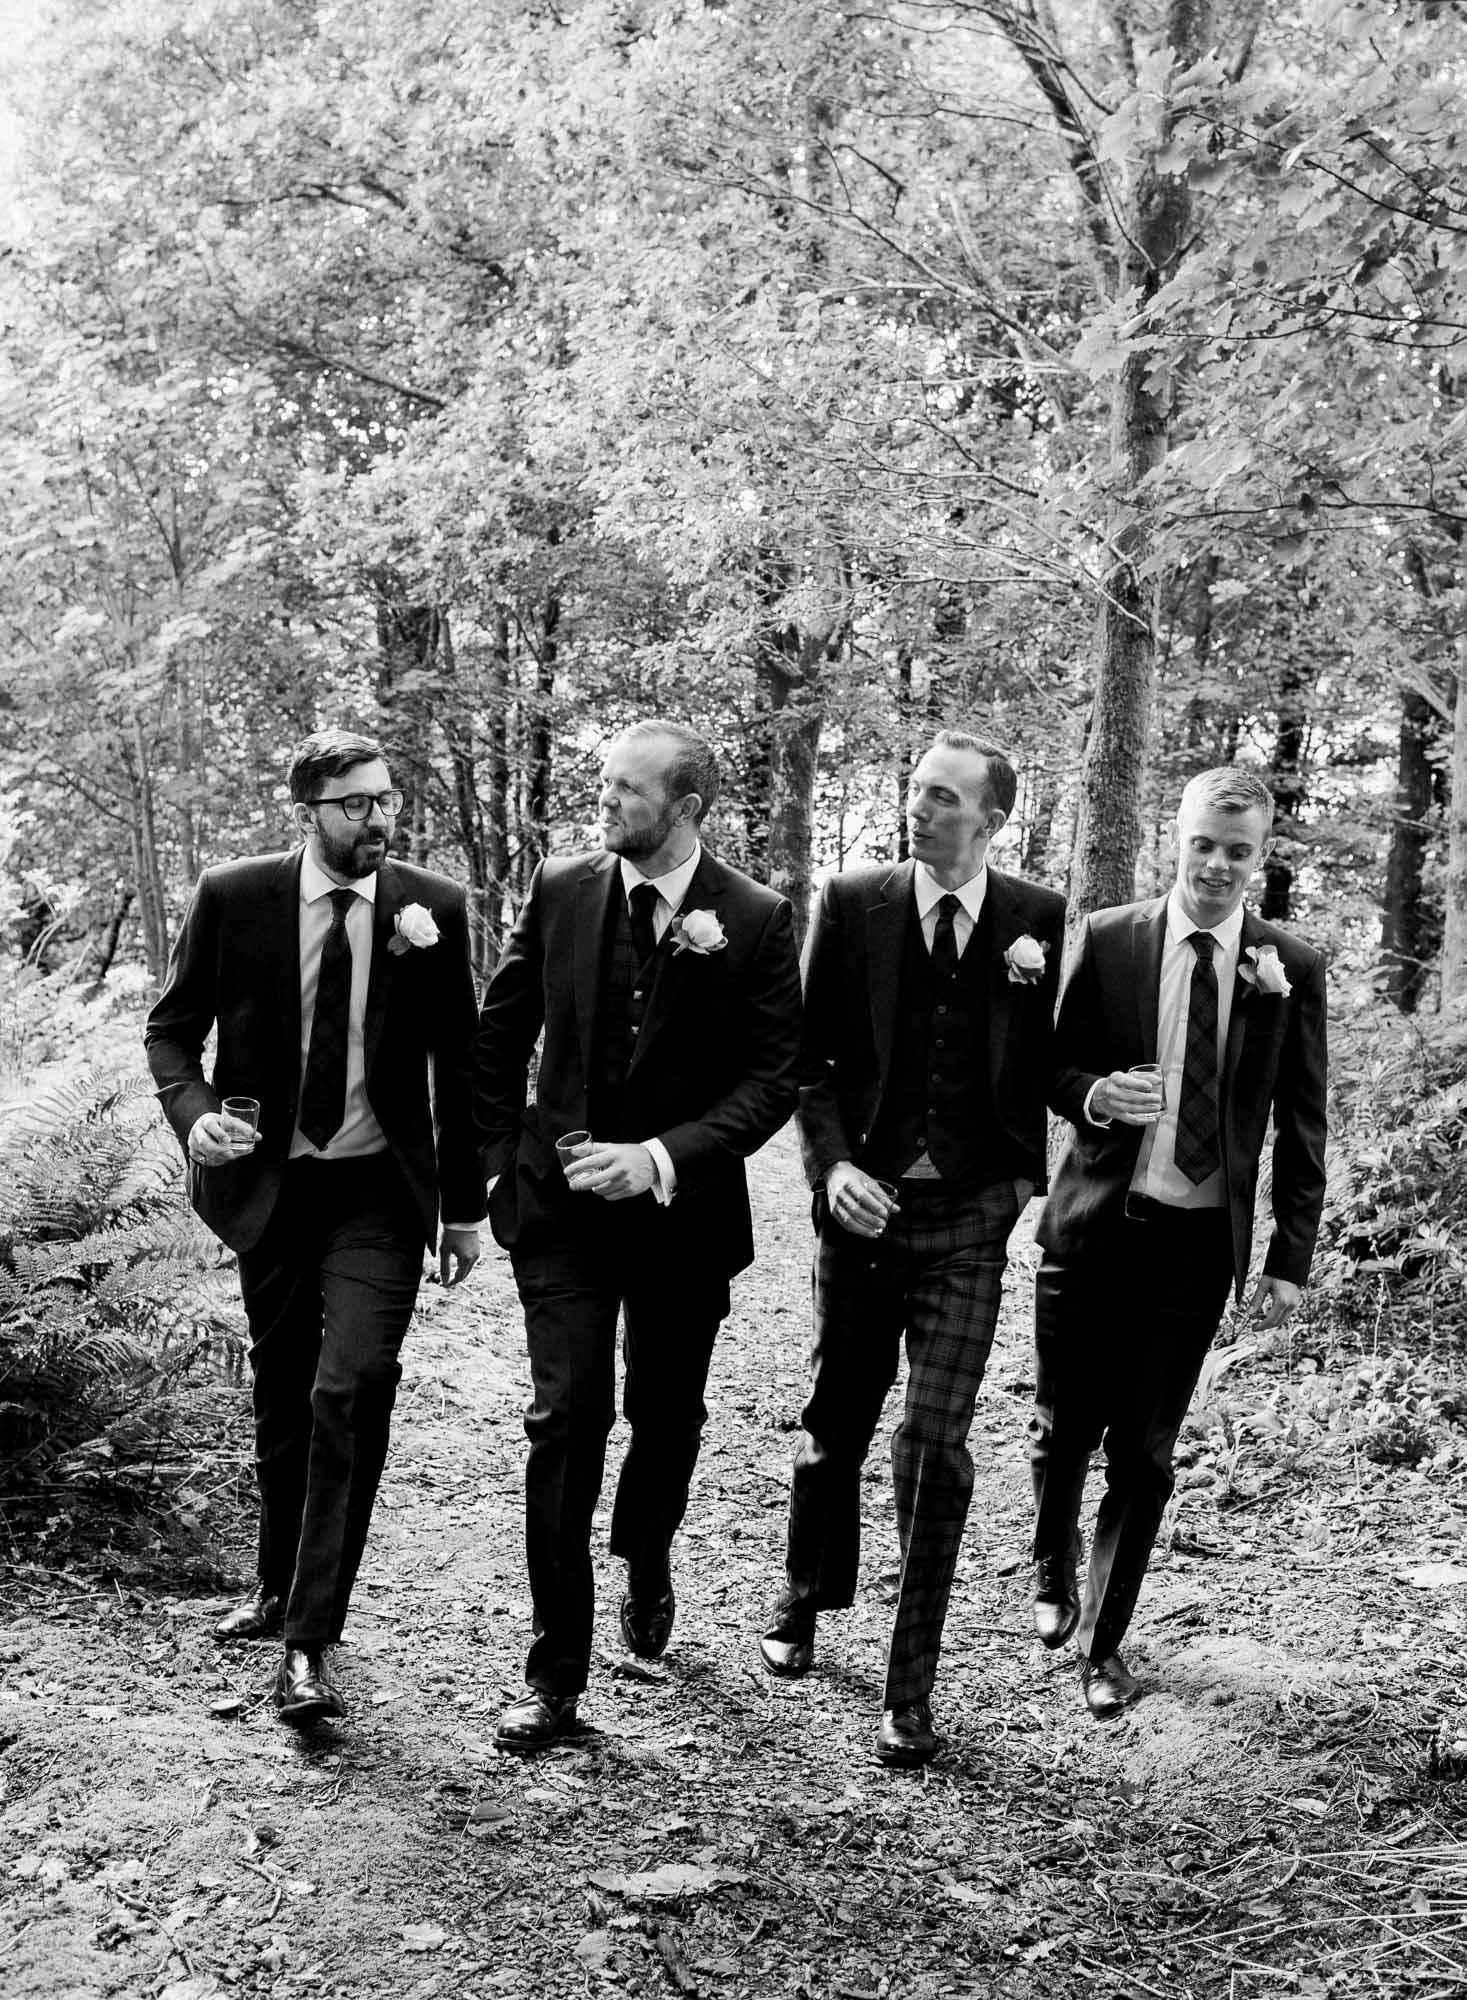 scottish_wedding_blairquhan_castle-29.jpg